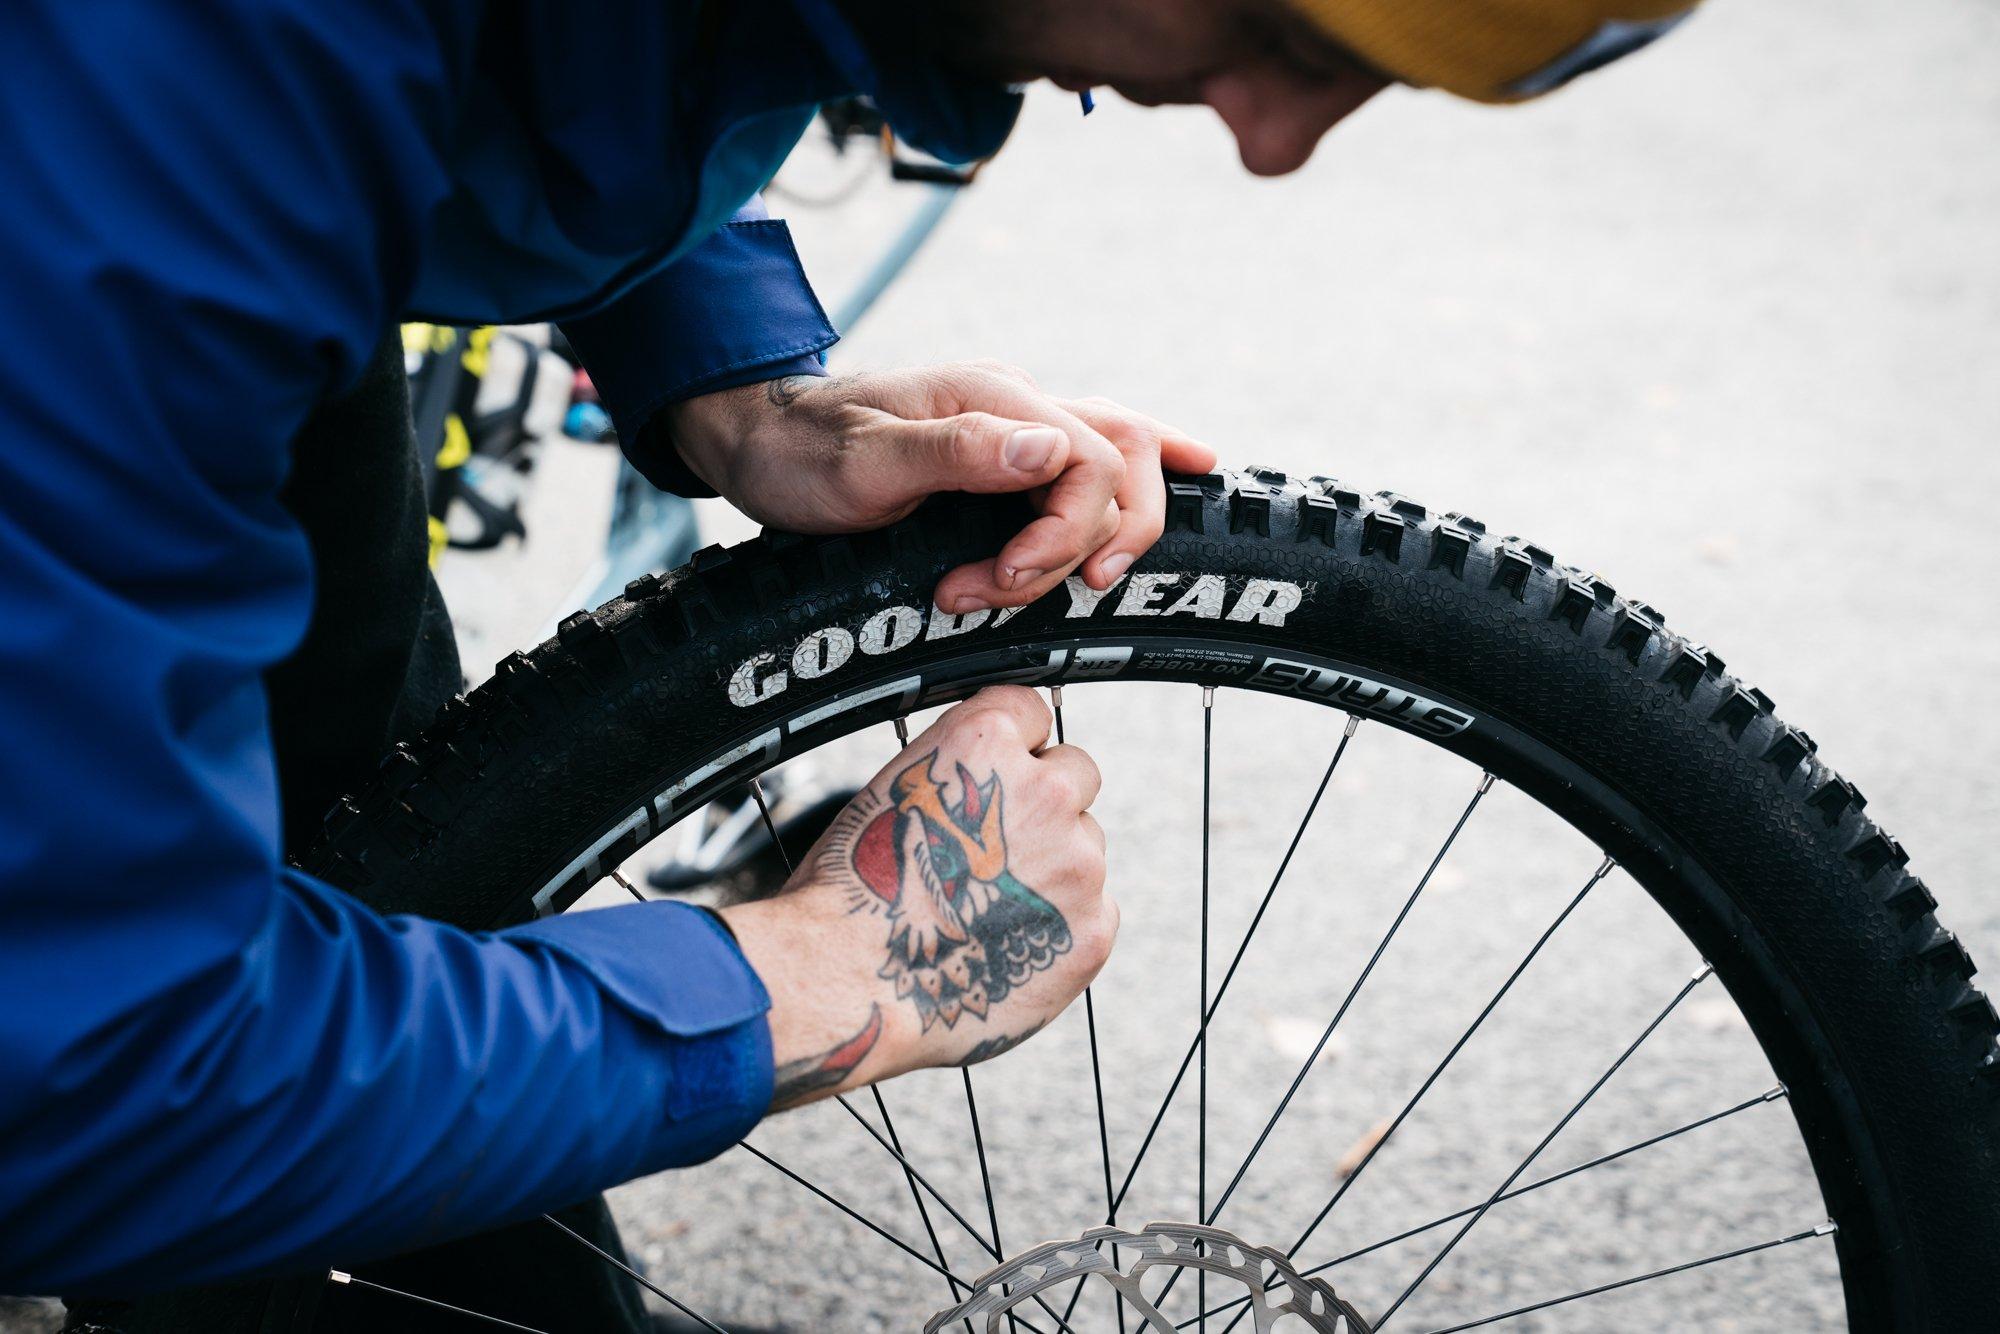 Clincher Tires vs Tubeless Tires